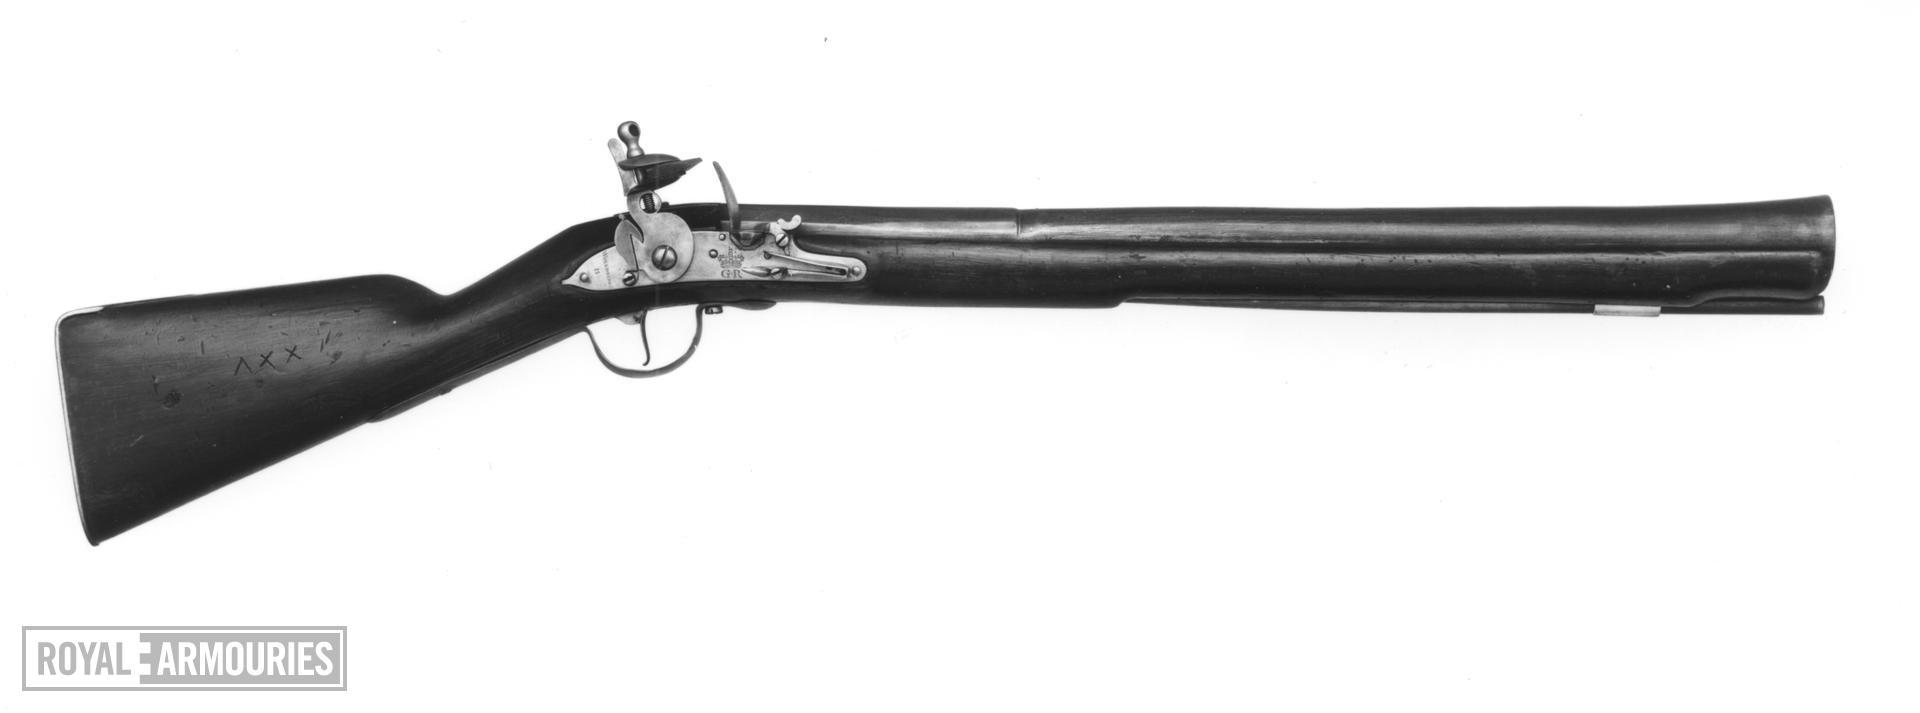 Flintlock muzzle-loading military musketoon - Pattern 1704 Sea Service